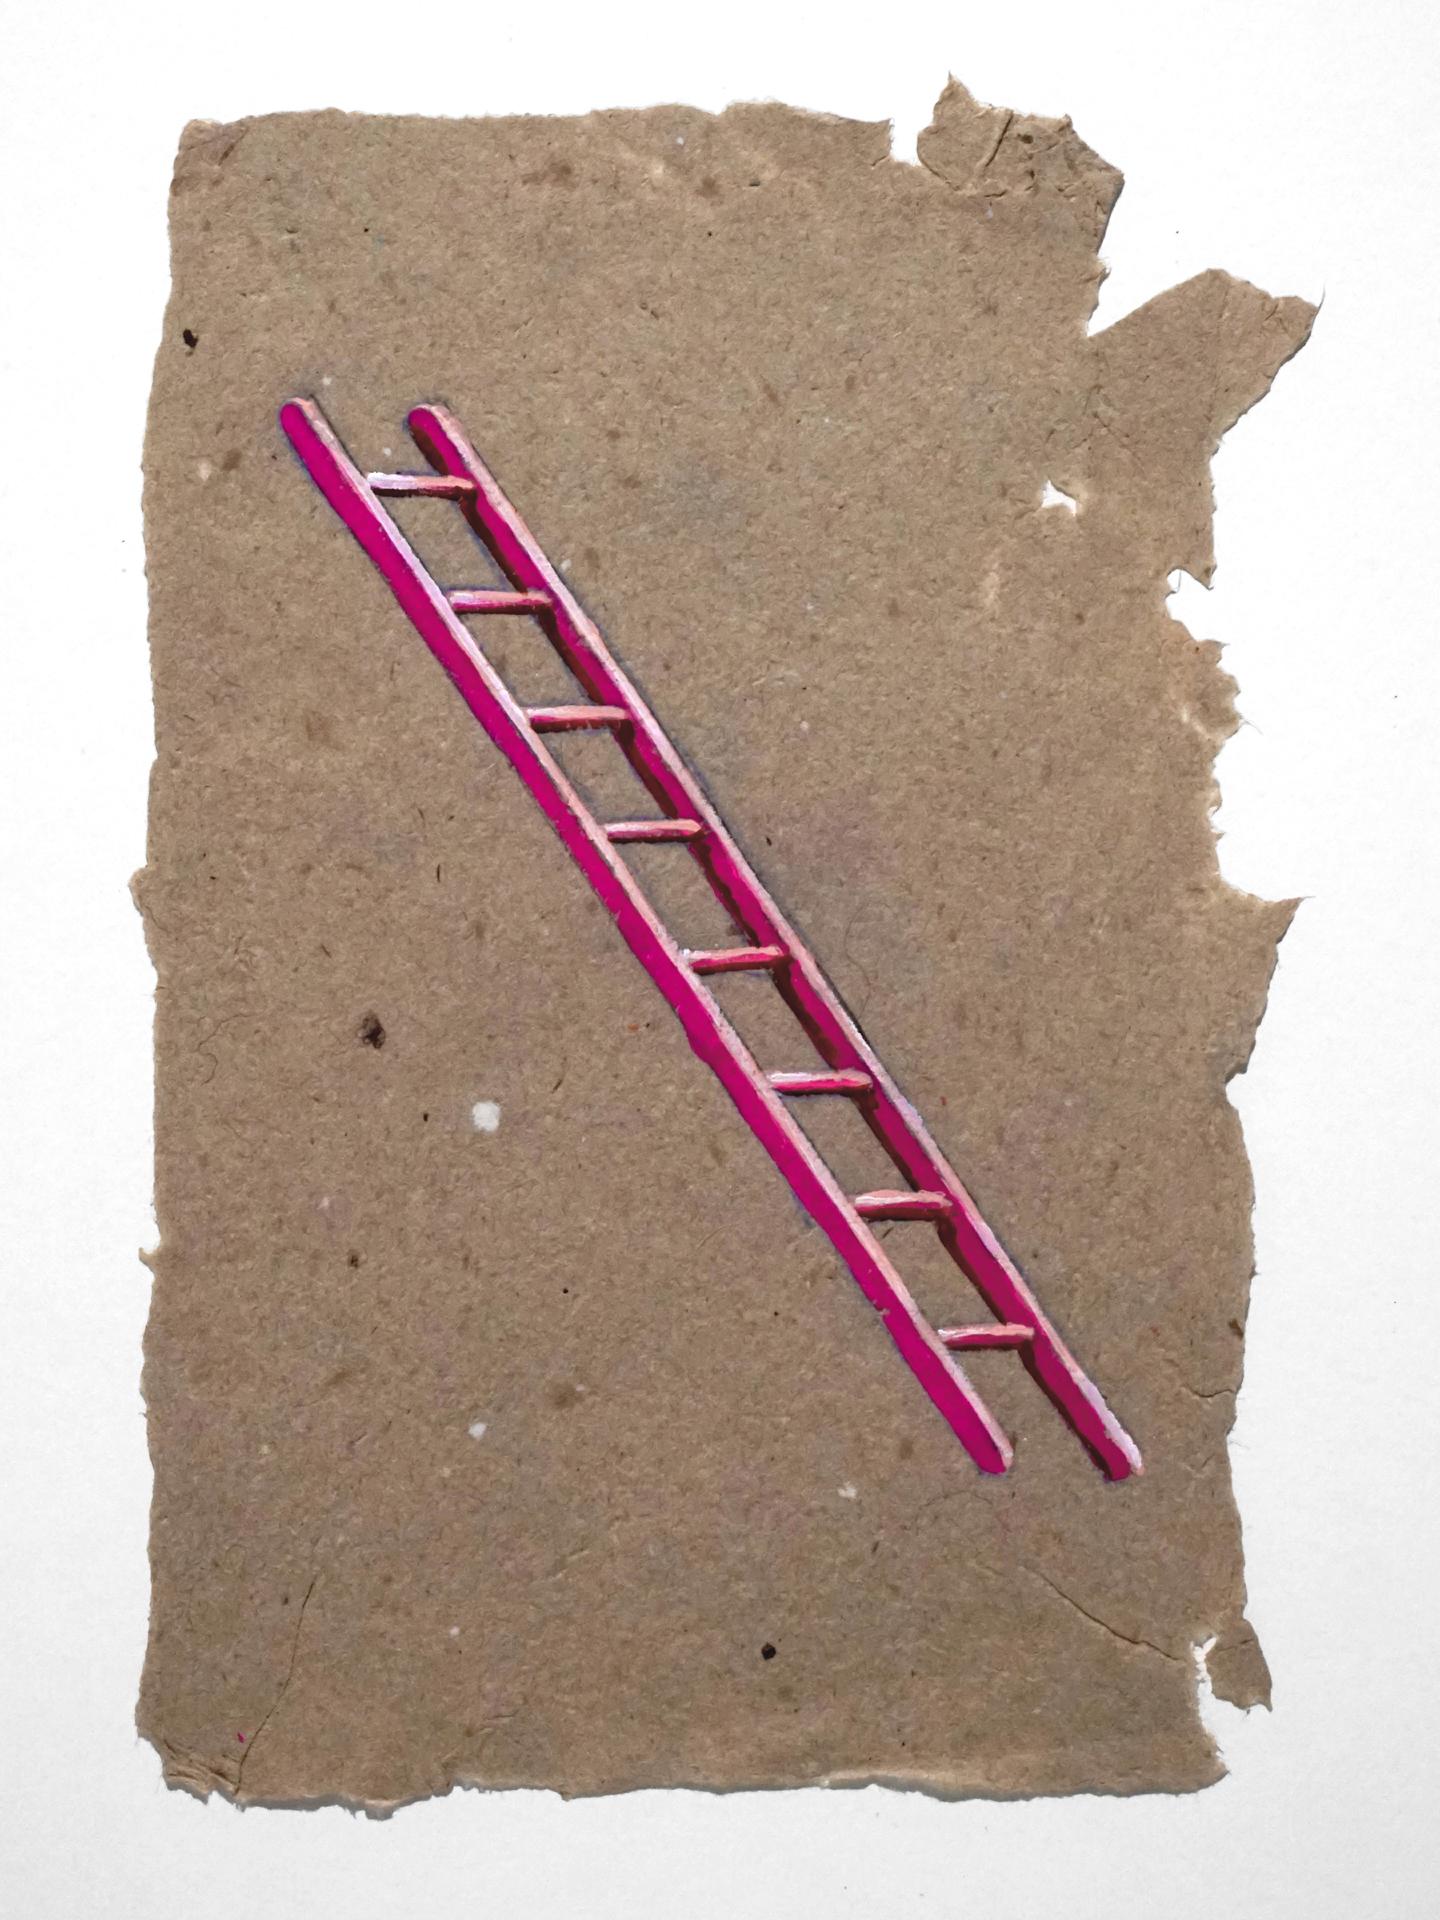 Untitled (pink ladder), 2010